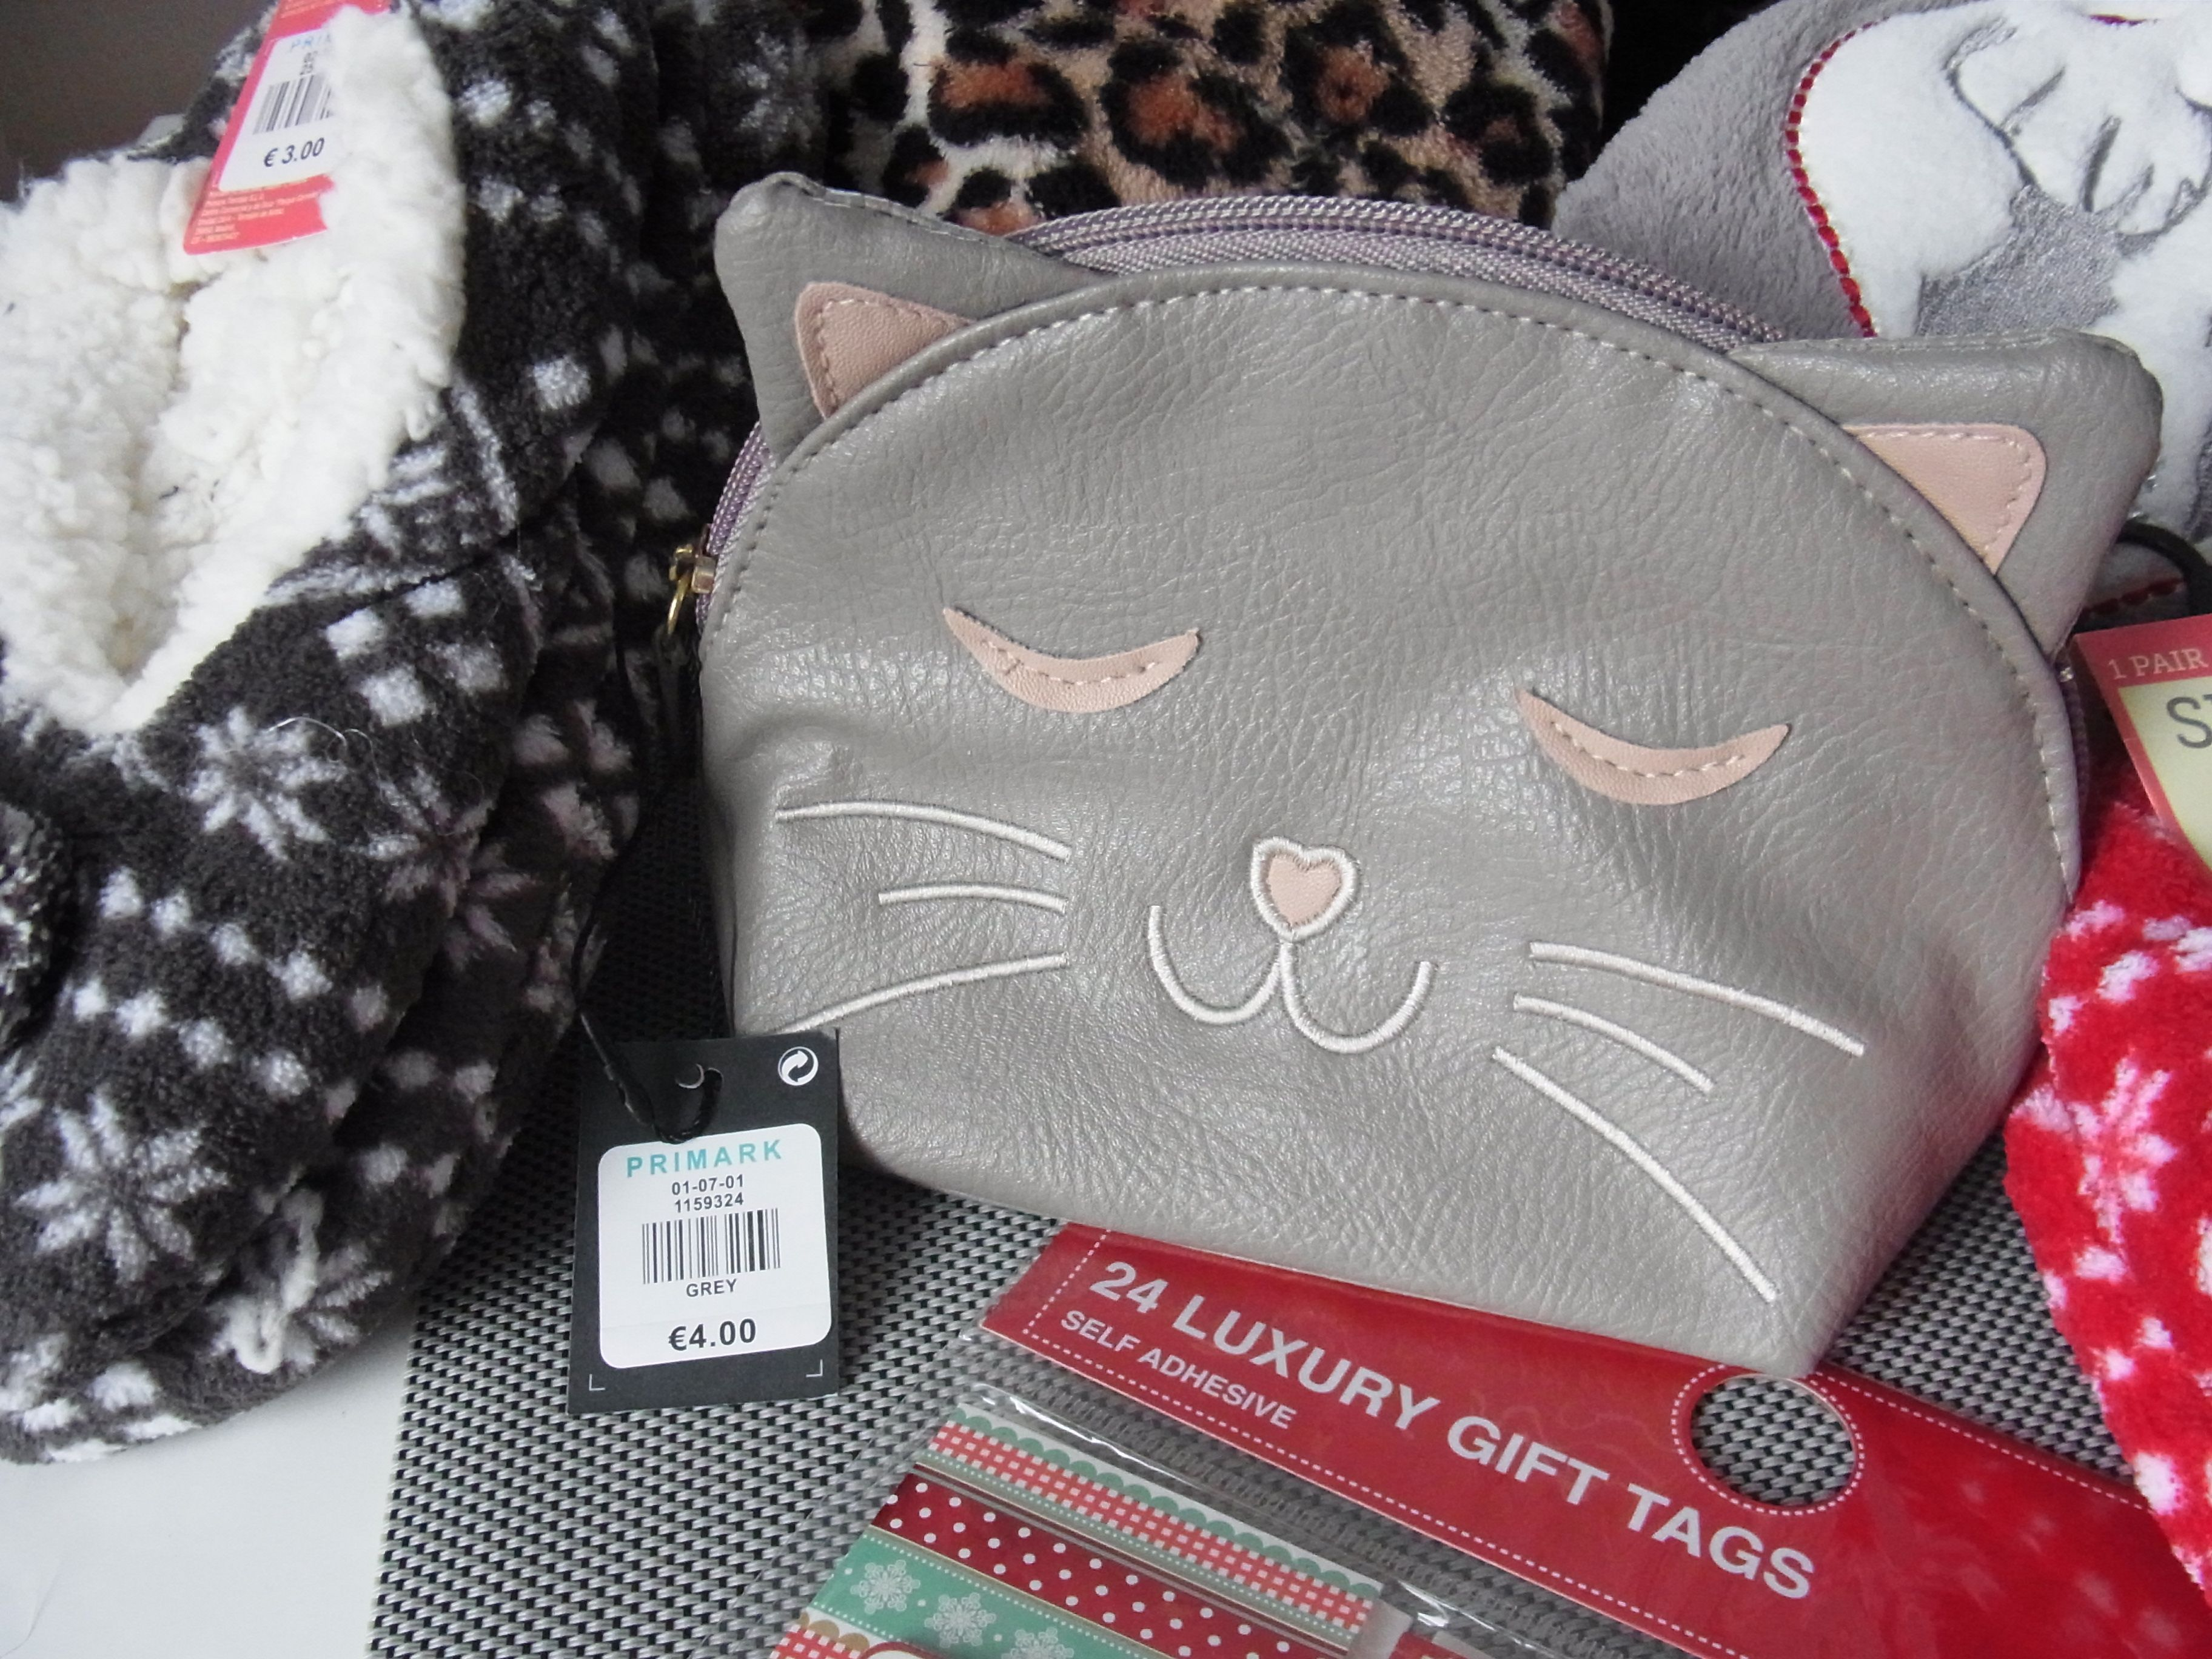 Primark Cosmetic Bag Cat Cute! Luxury gift tags, Cat